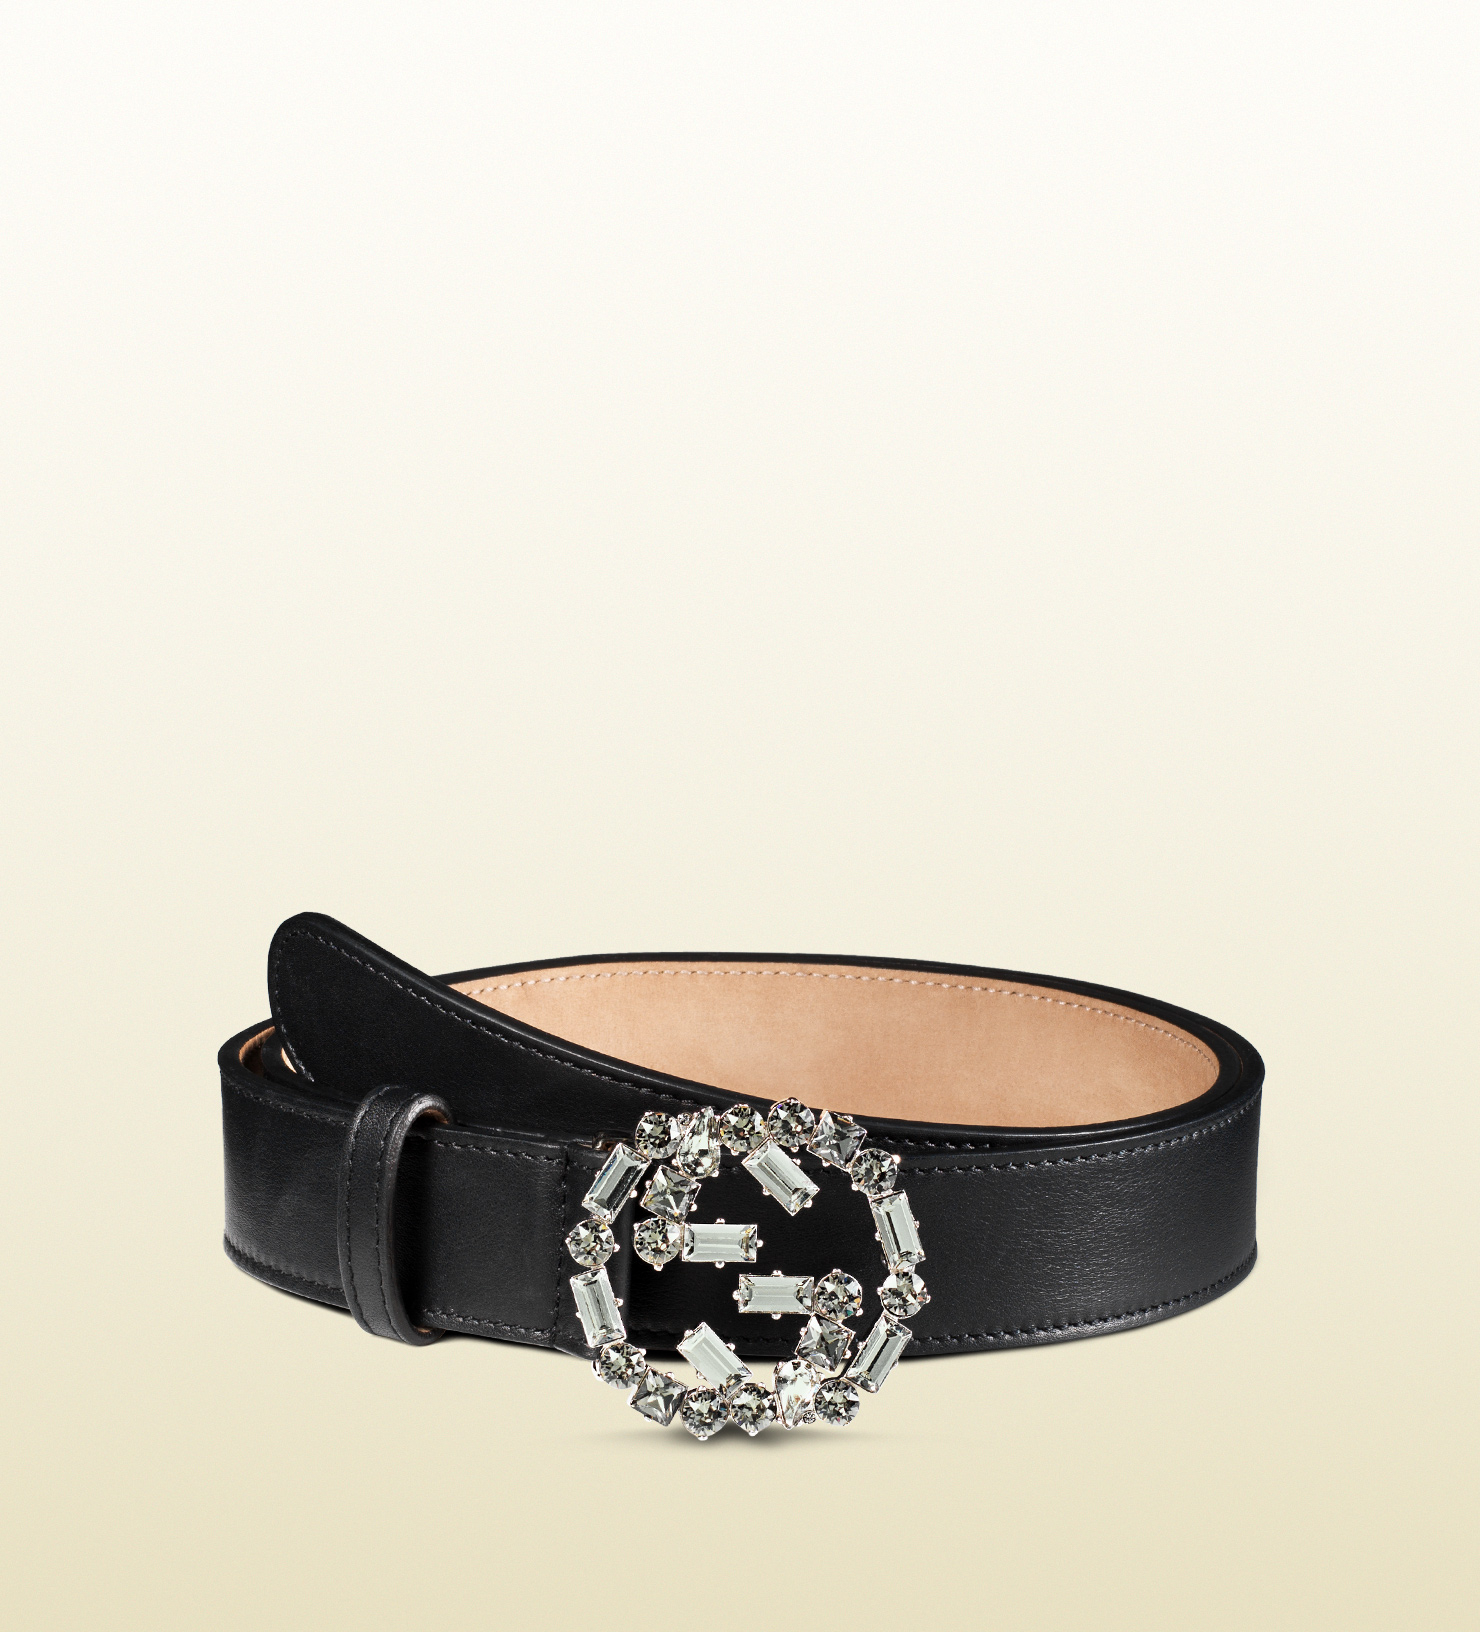 d44a87b120b Lyst - Gucci Leather Belt With Crystal Interlocking G Buckle in ...